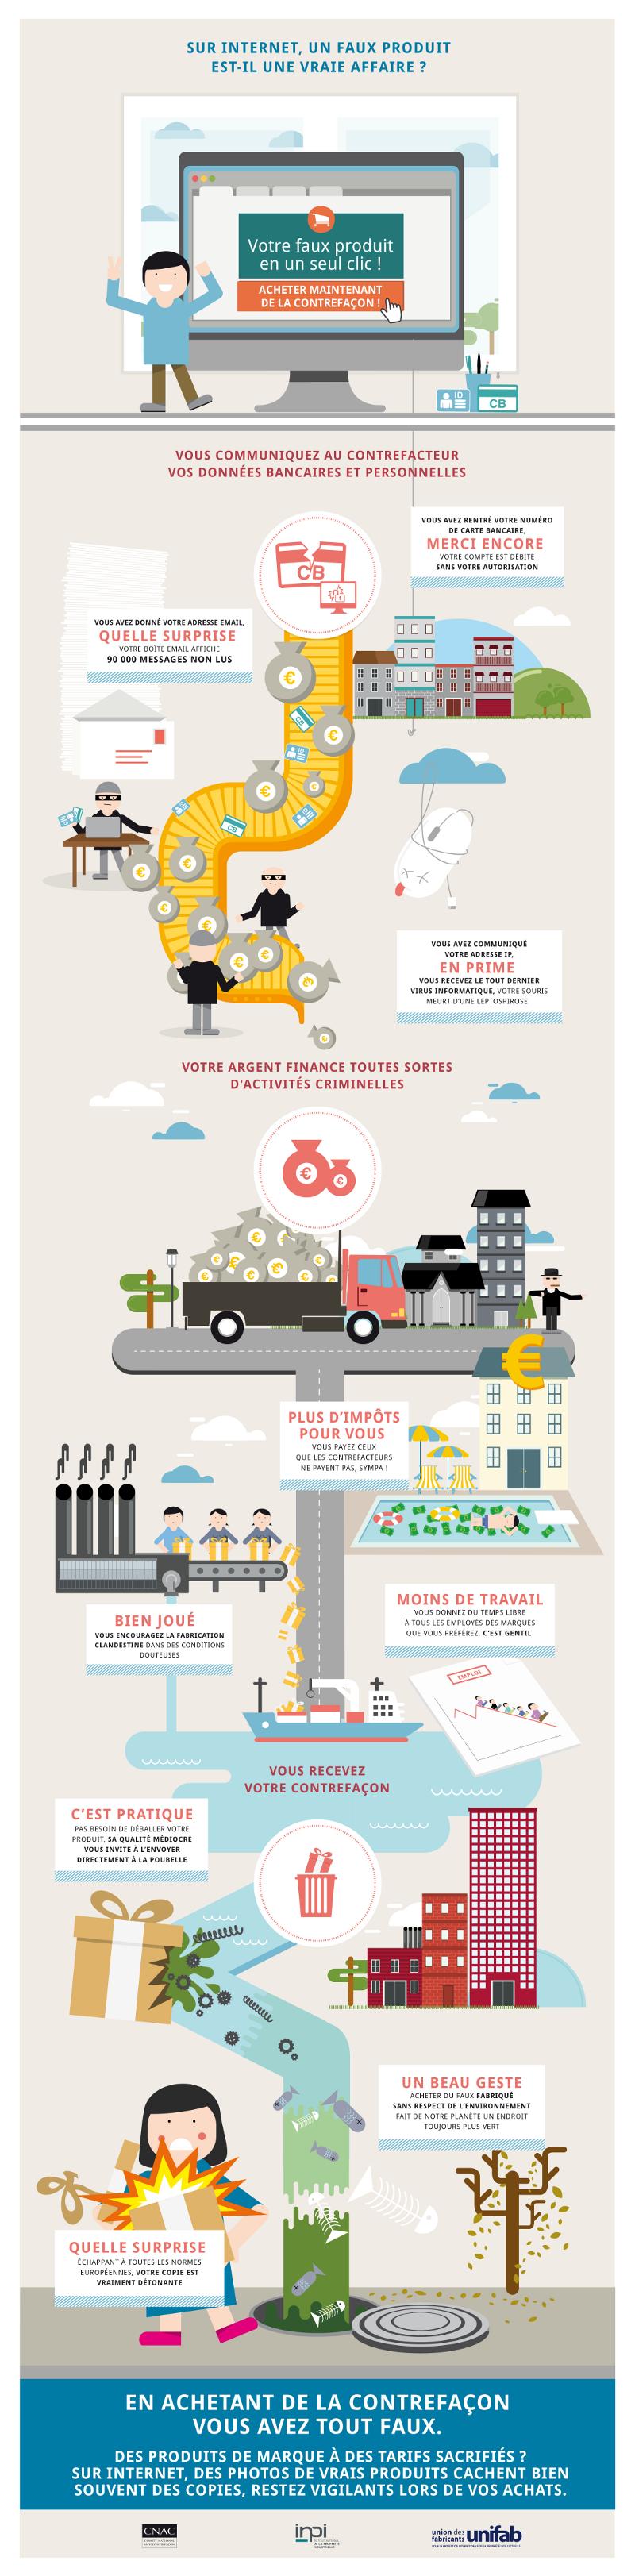 infographie-contrefacon